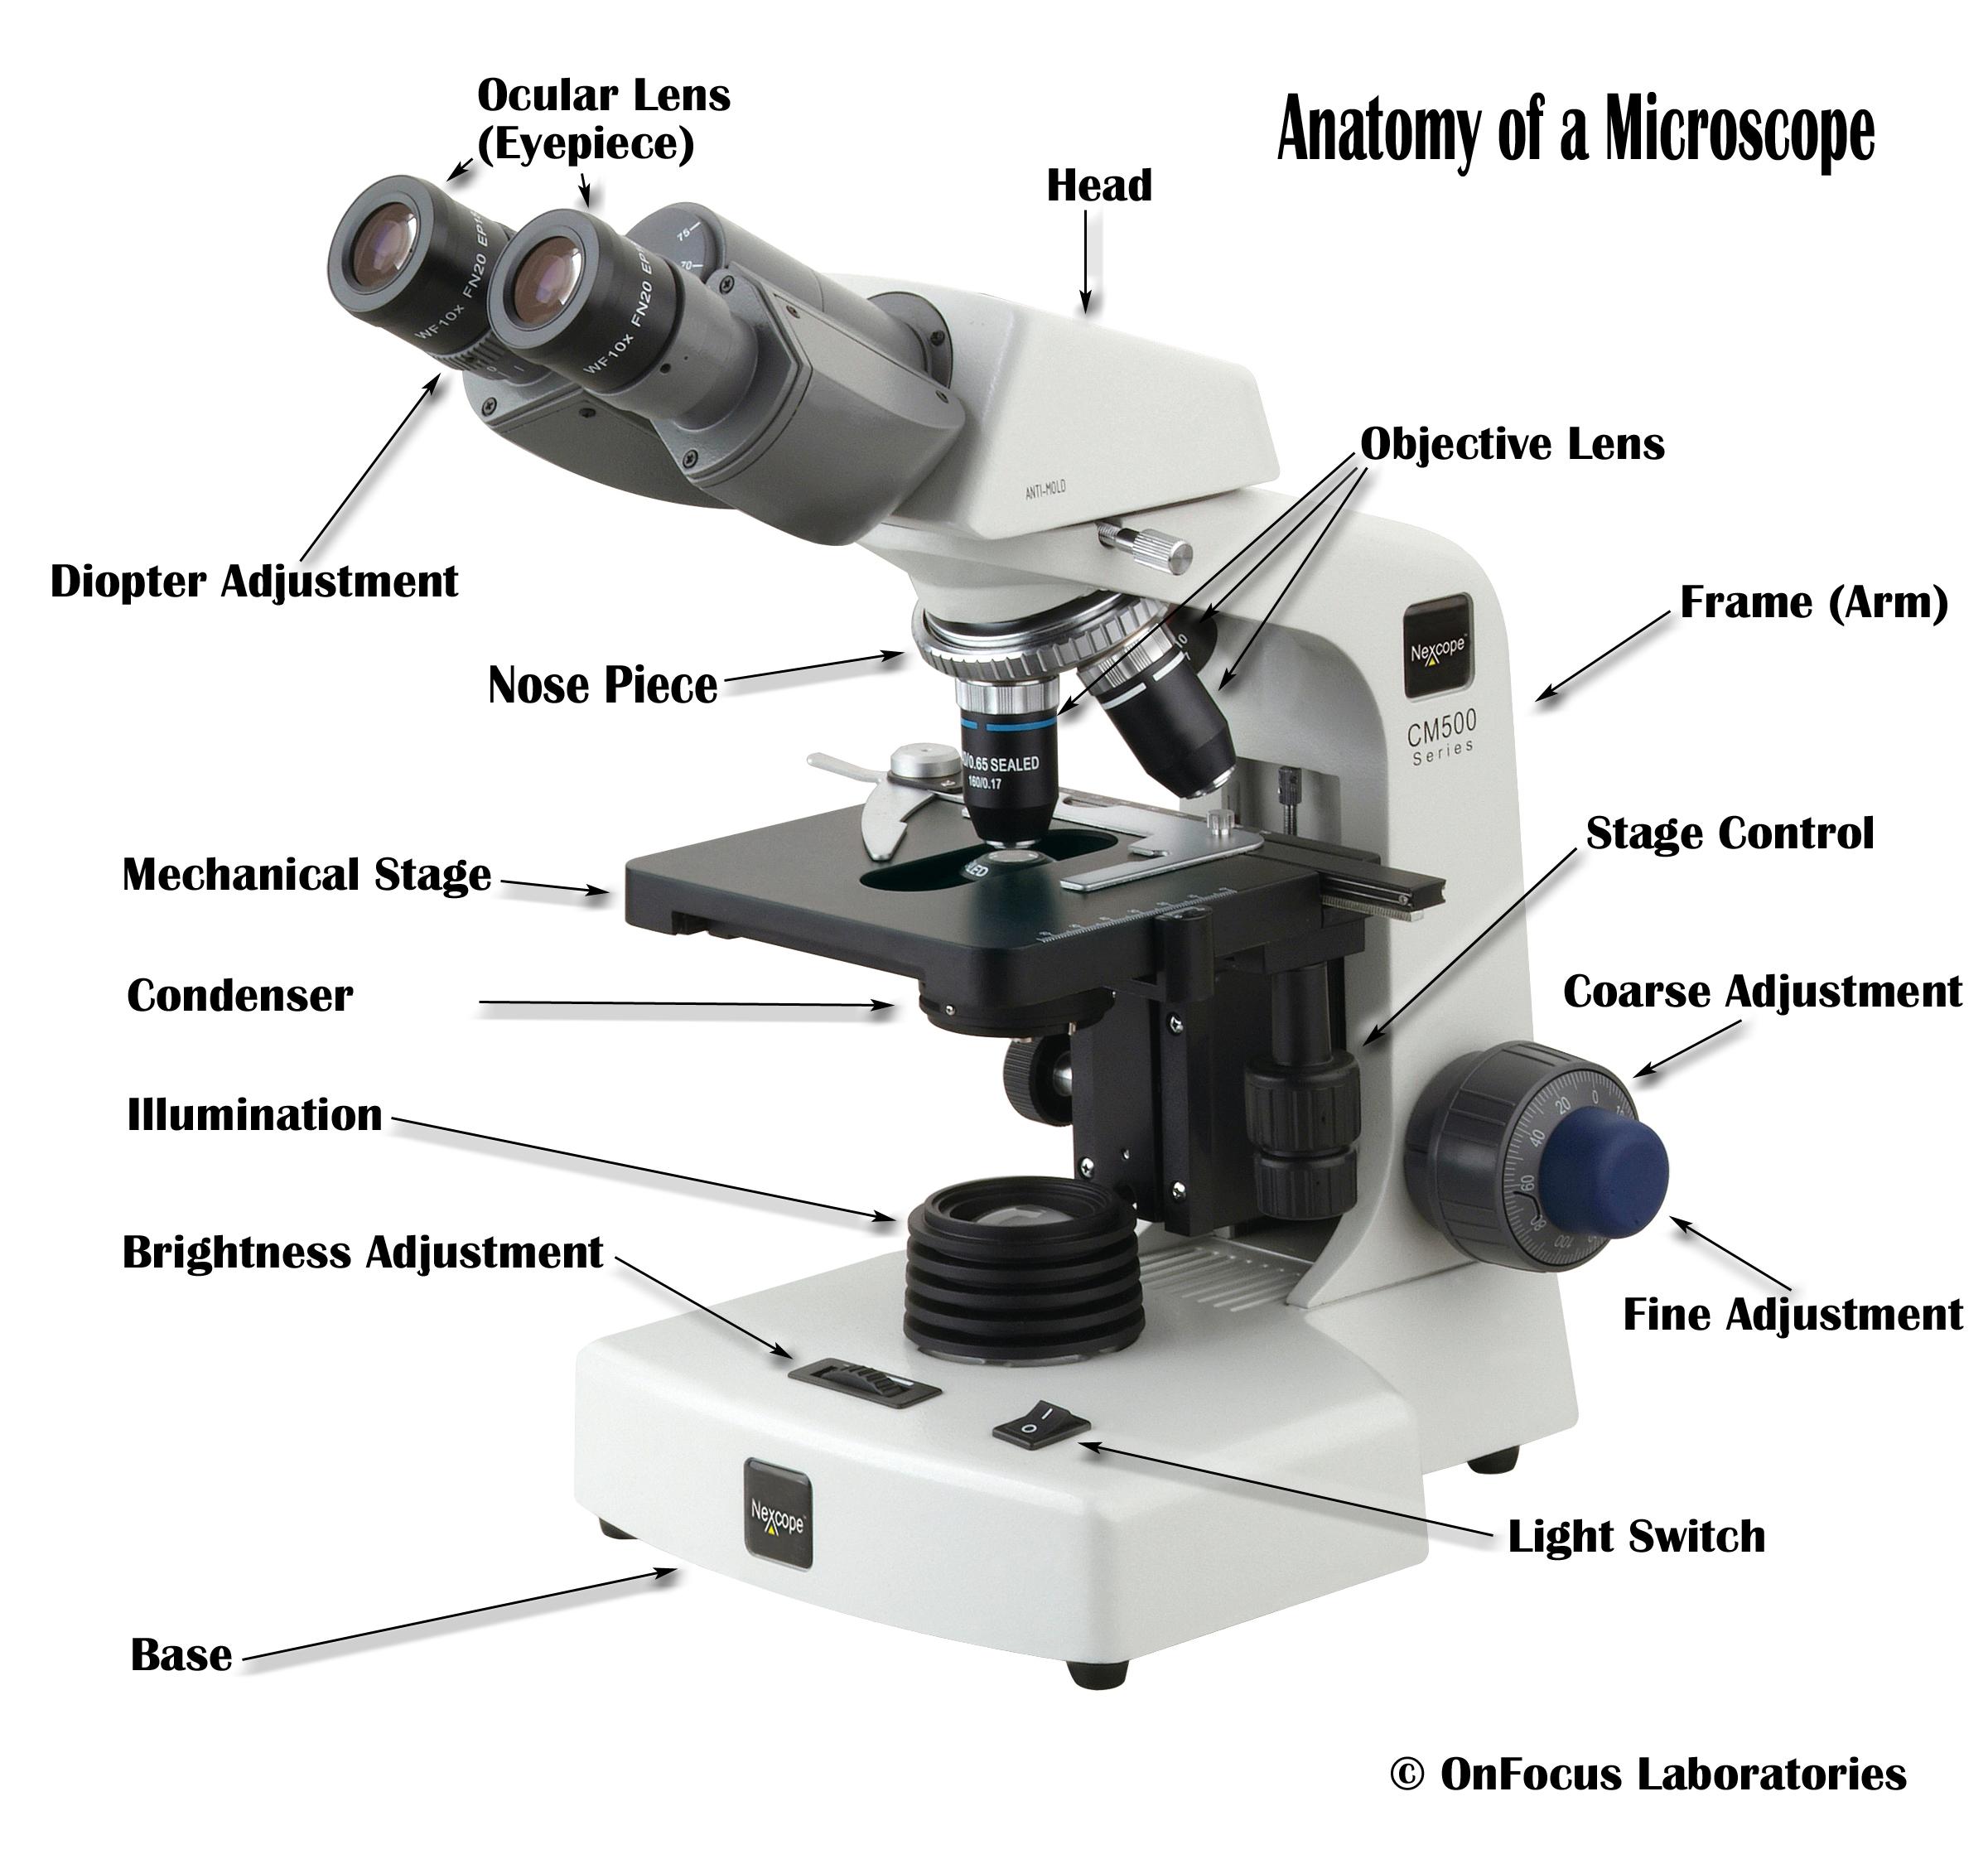 leica compound microscope diagram wiring diagrams value leica compound microscope diagram [ 2400 x 2250 Pixel ]